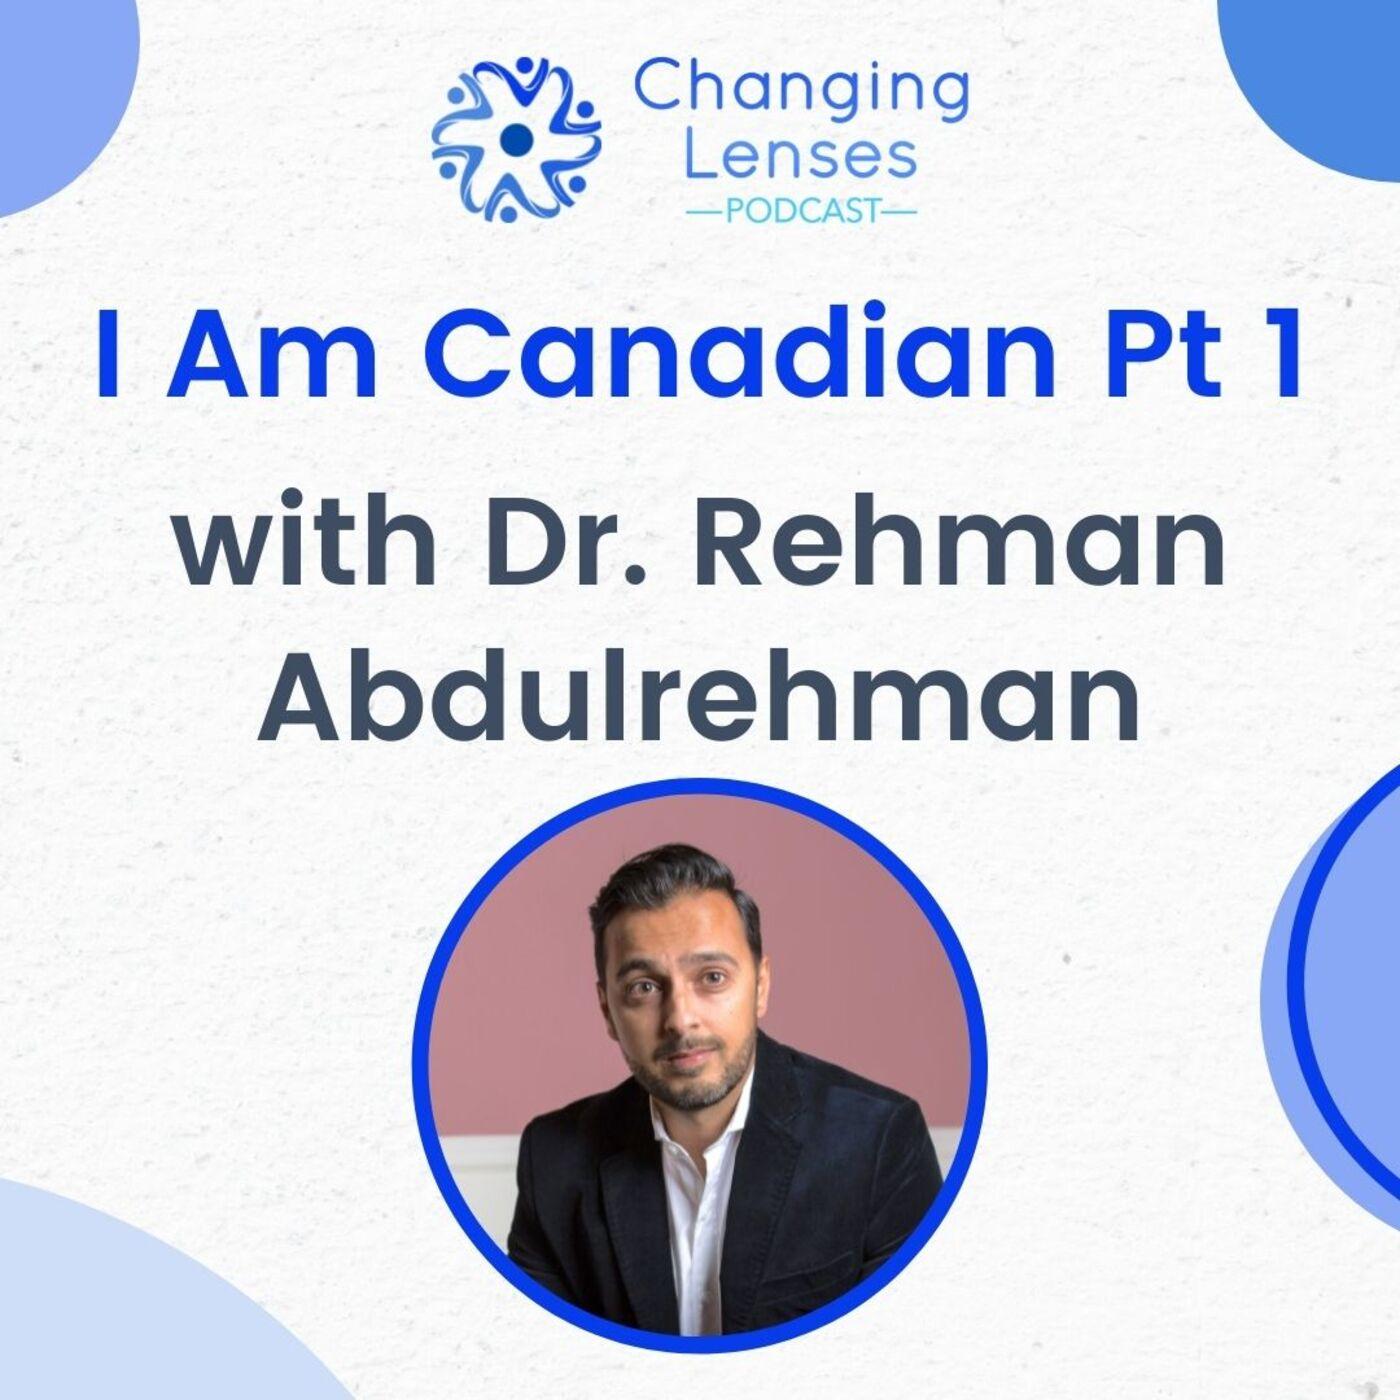 Ep02: I Am Canadian Part 1, with Dr. Rehman Abdulrehman